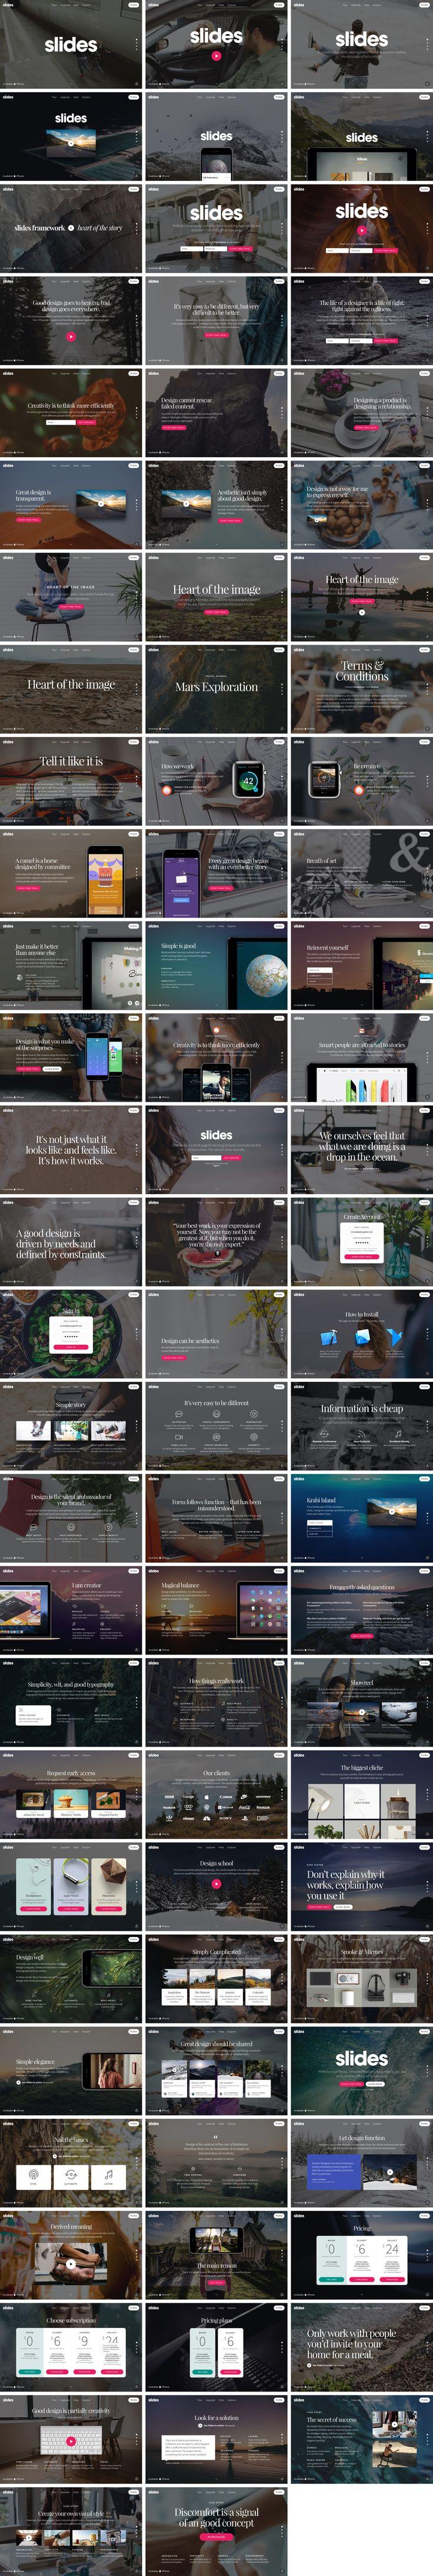 A Huge pack of design resources for Photoshop & Sketch. Download for free: http://designmodo.com/slides/resources/